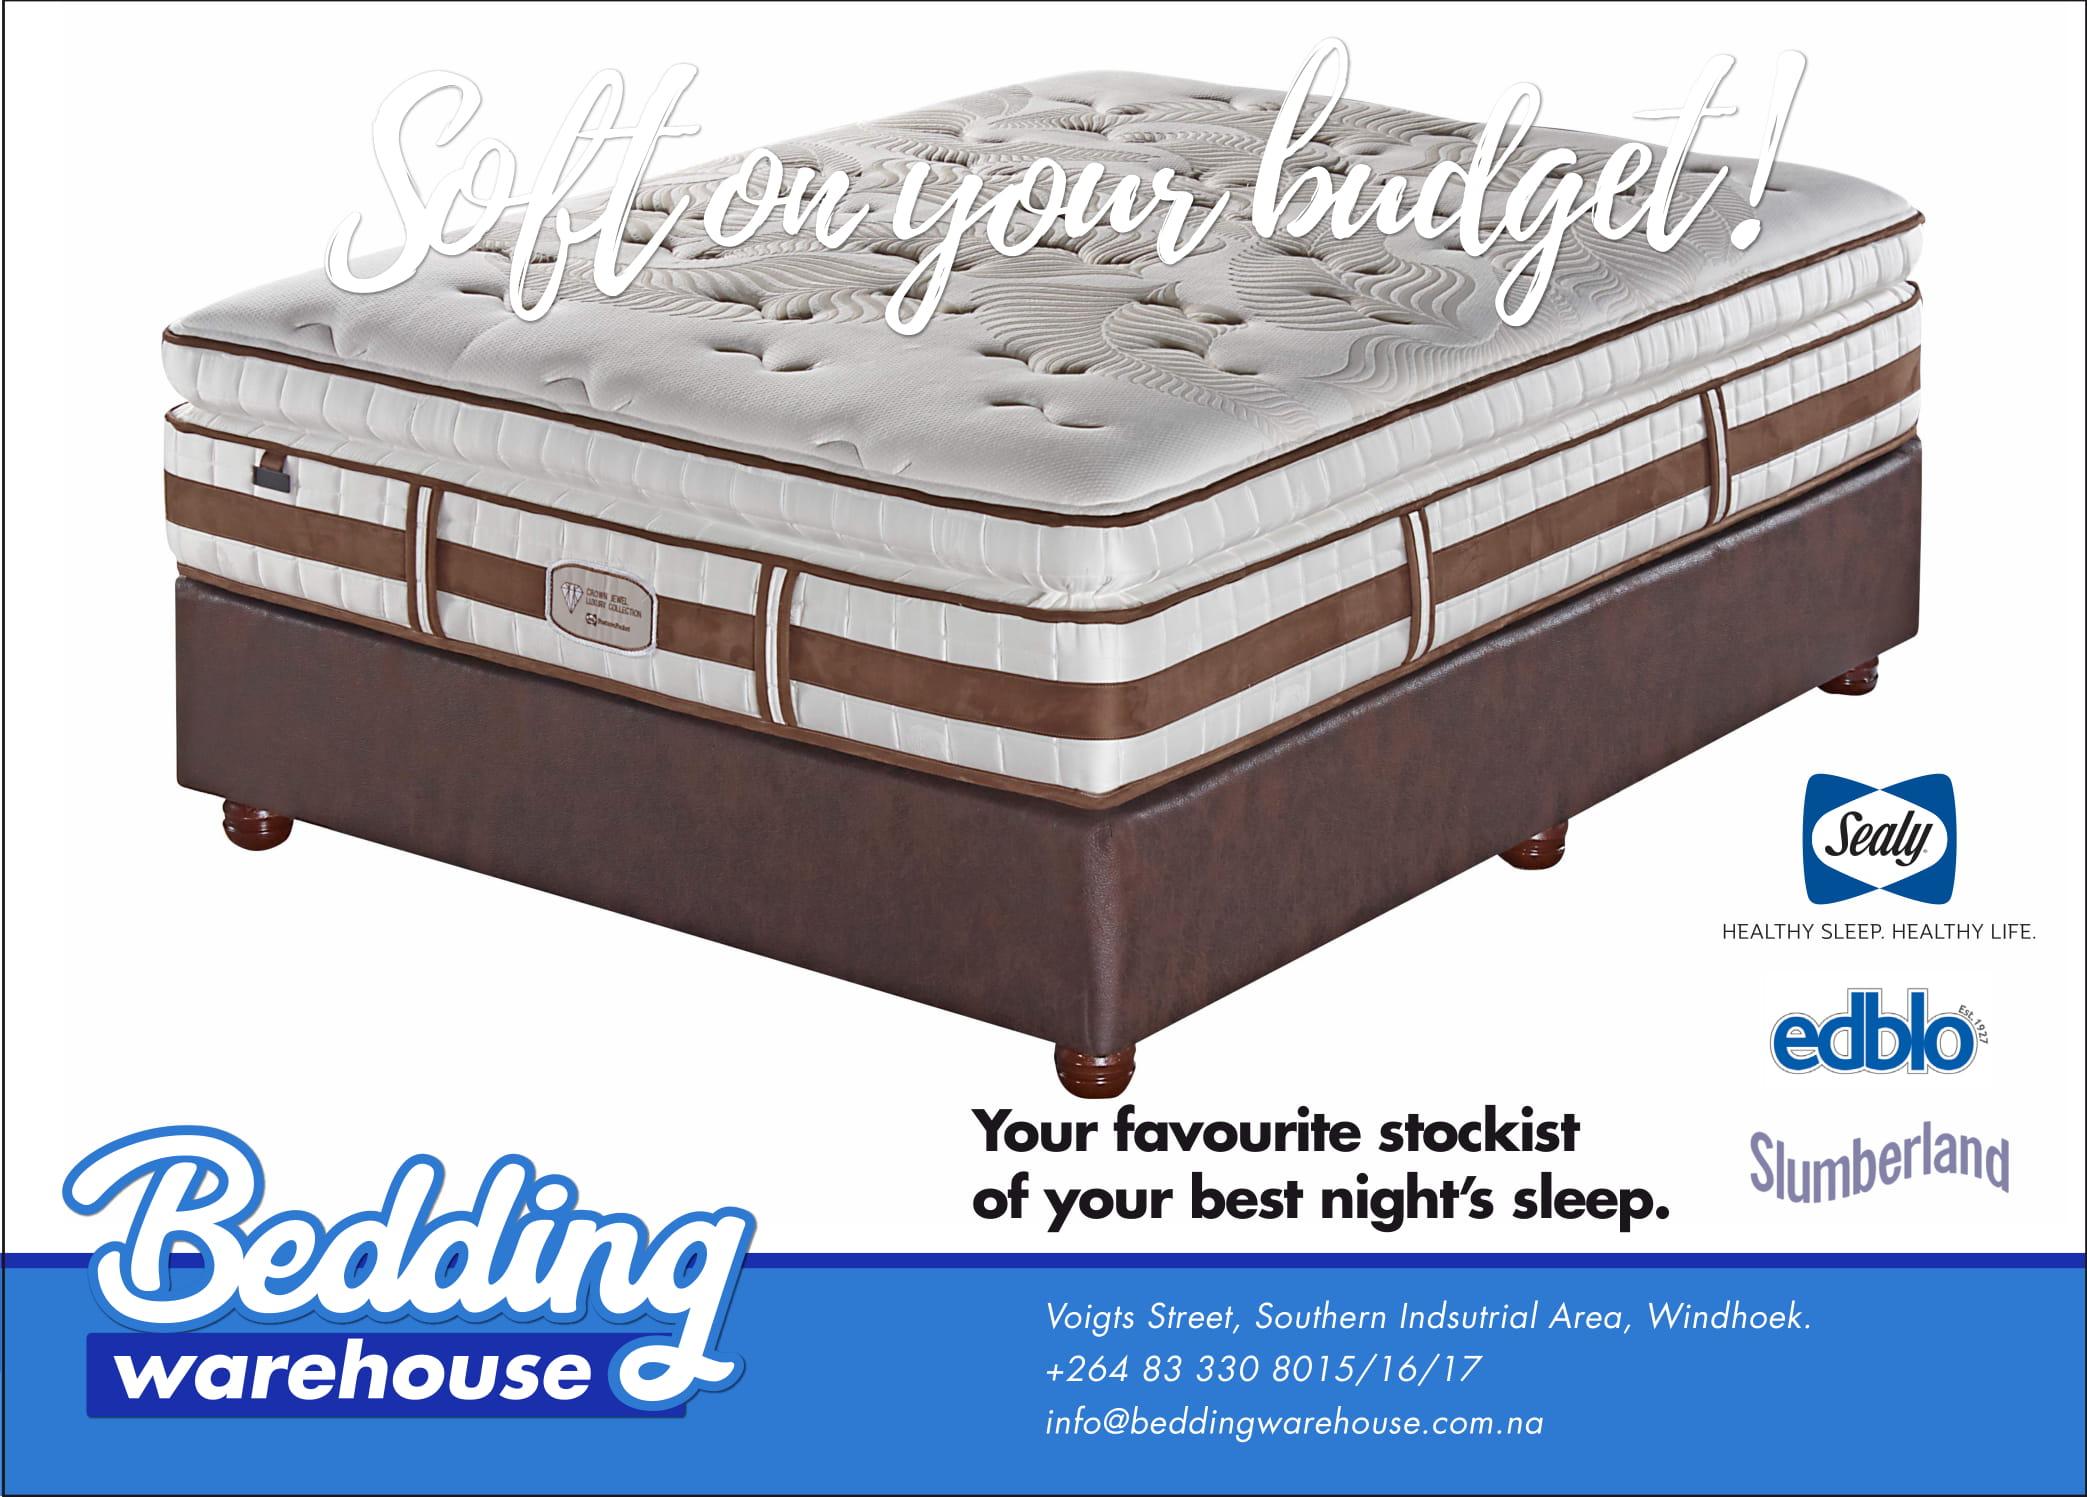 Bedding Warehouse